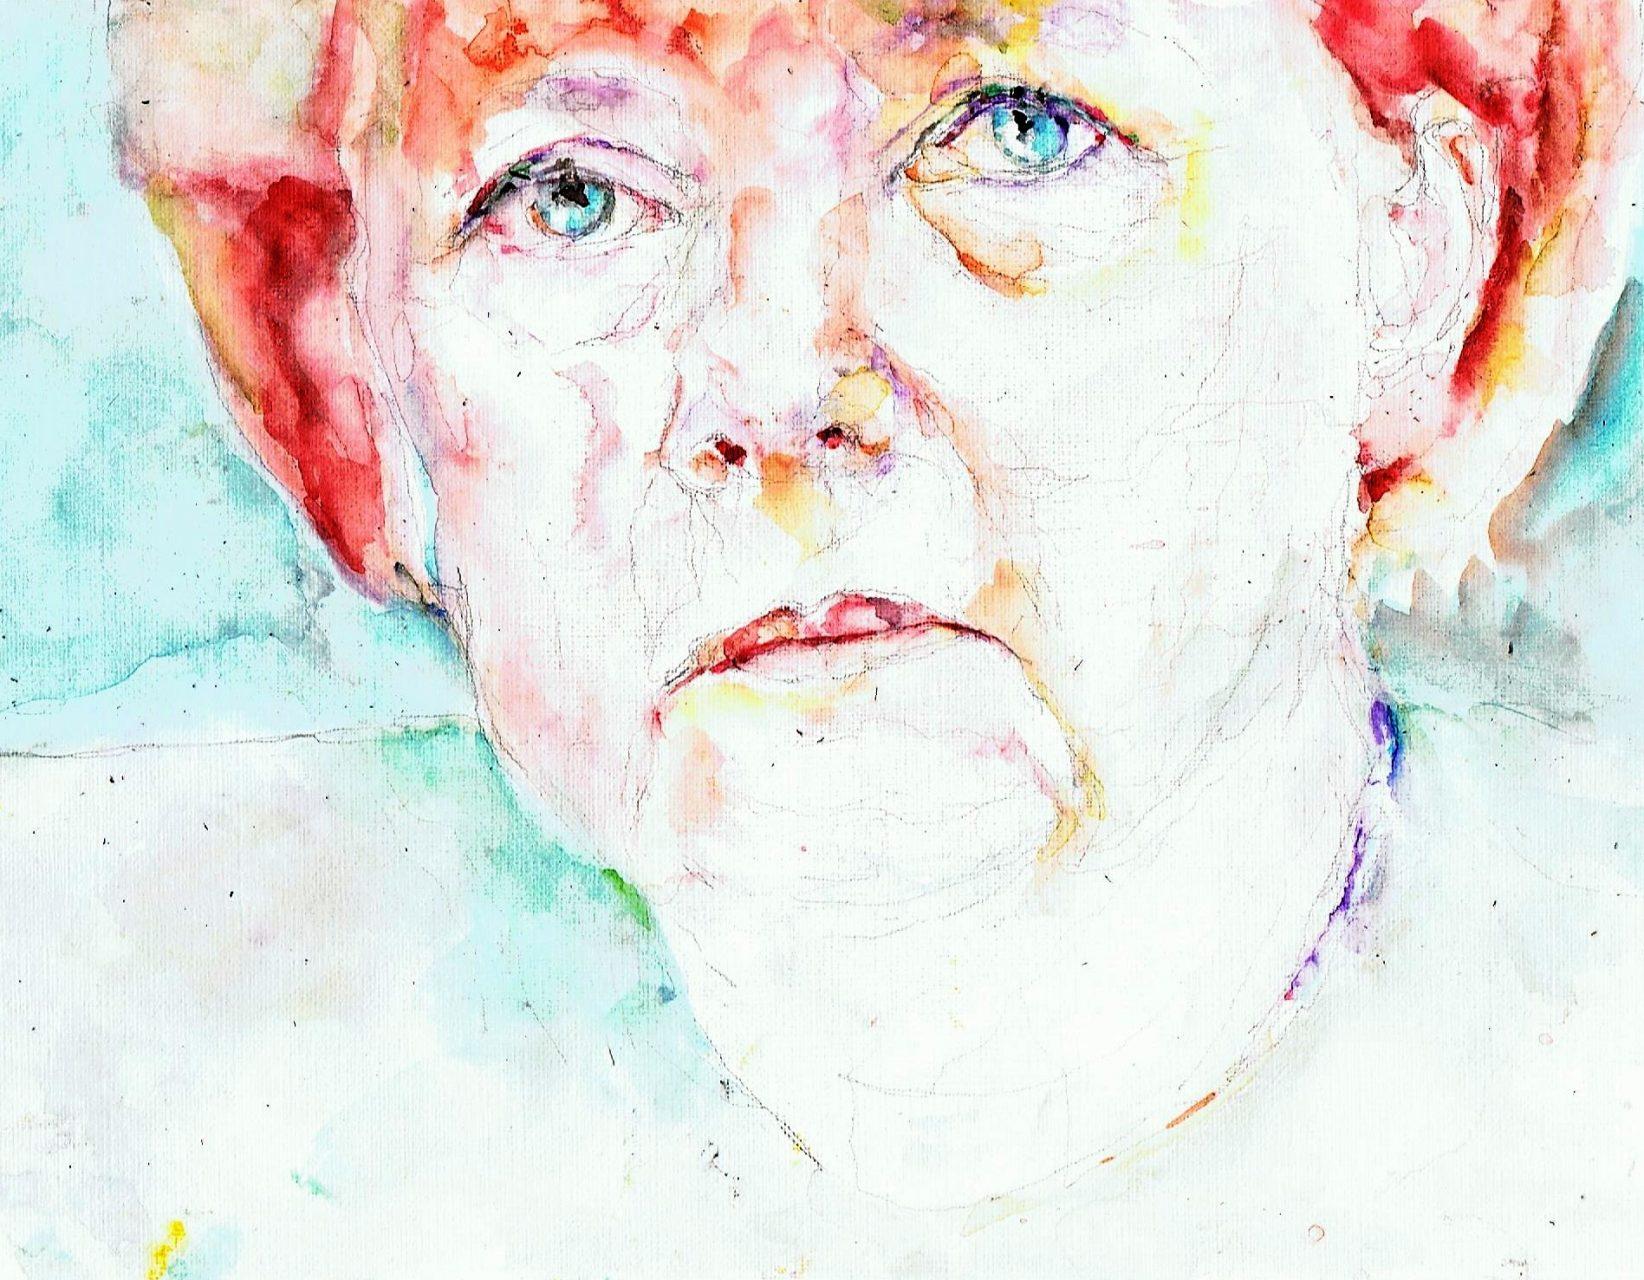 365 dagen een portret 69 Angela Merkel, premier Duitsland Aquarel 19c25